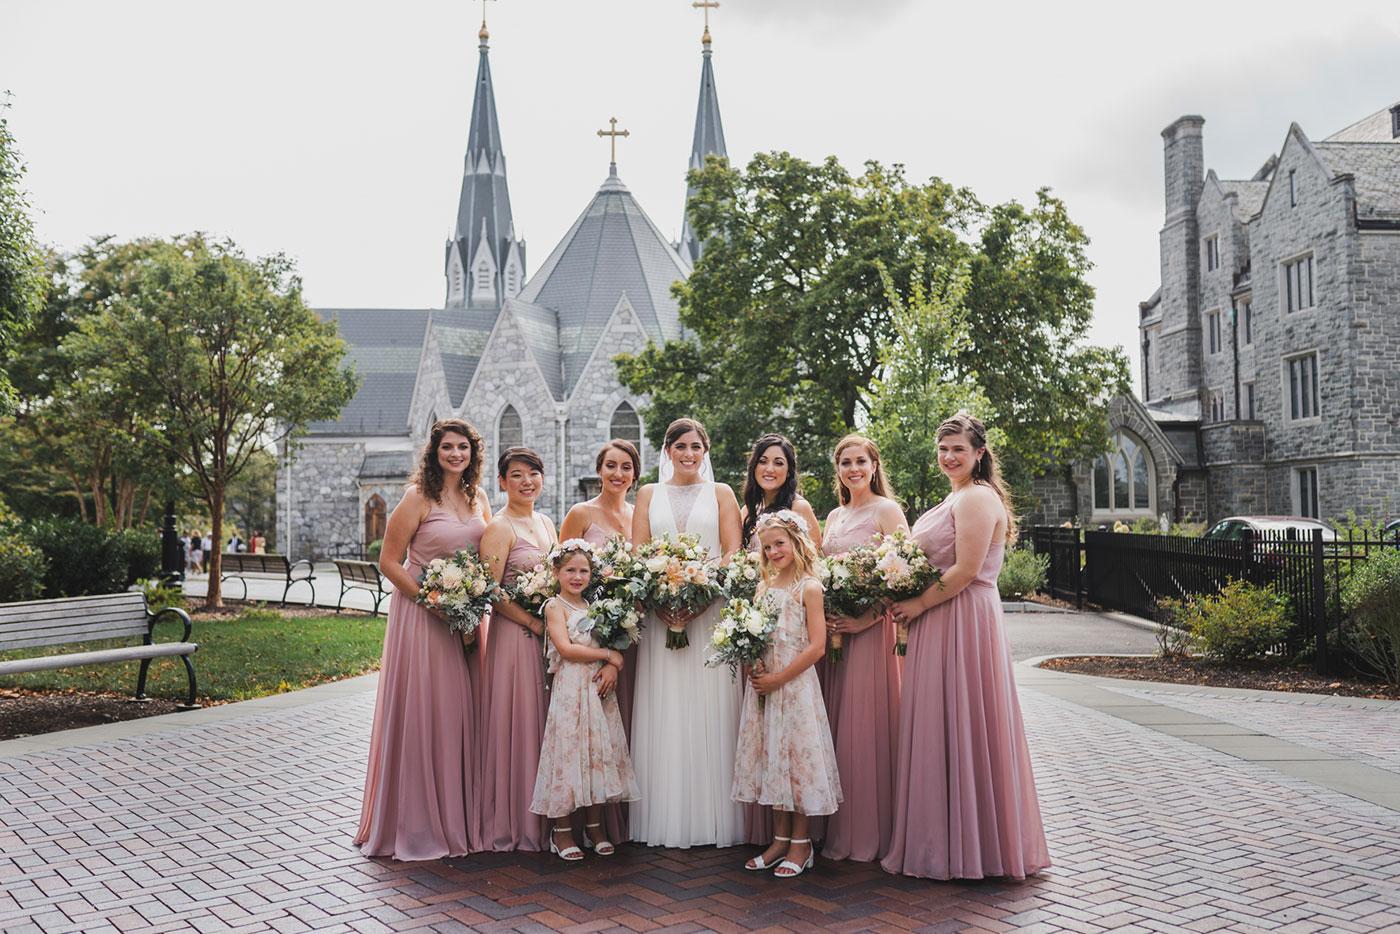 bride and bridesmaids from a wedding at Saint Thomas of Villanova by Weddings by Hanel